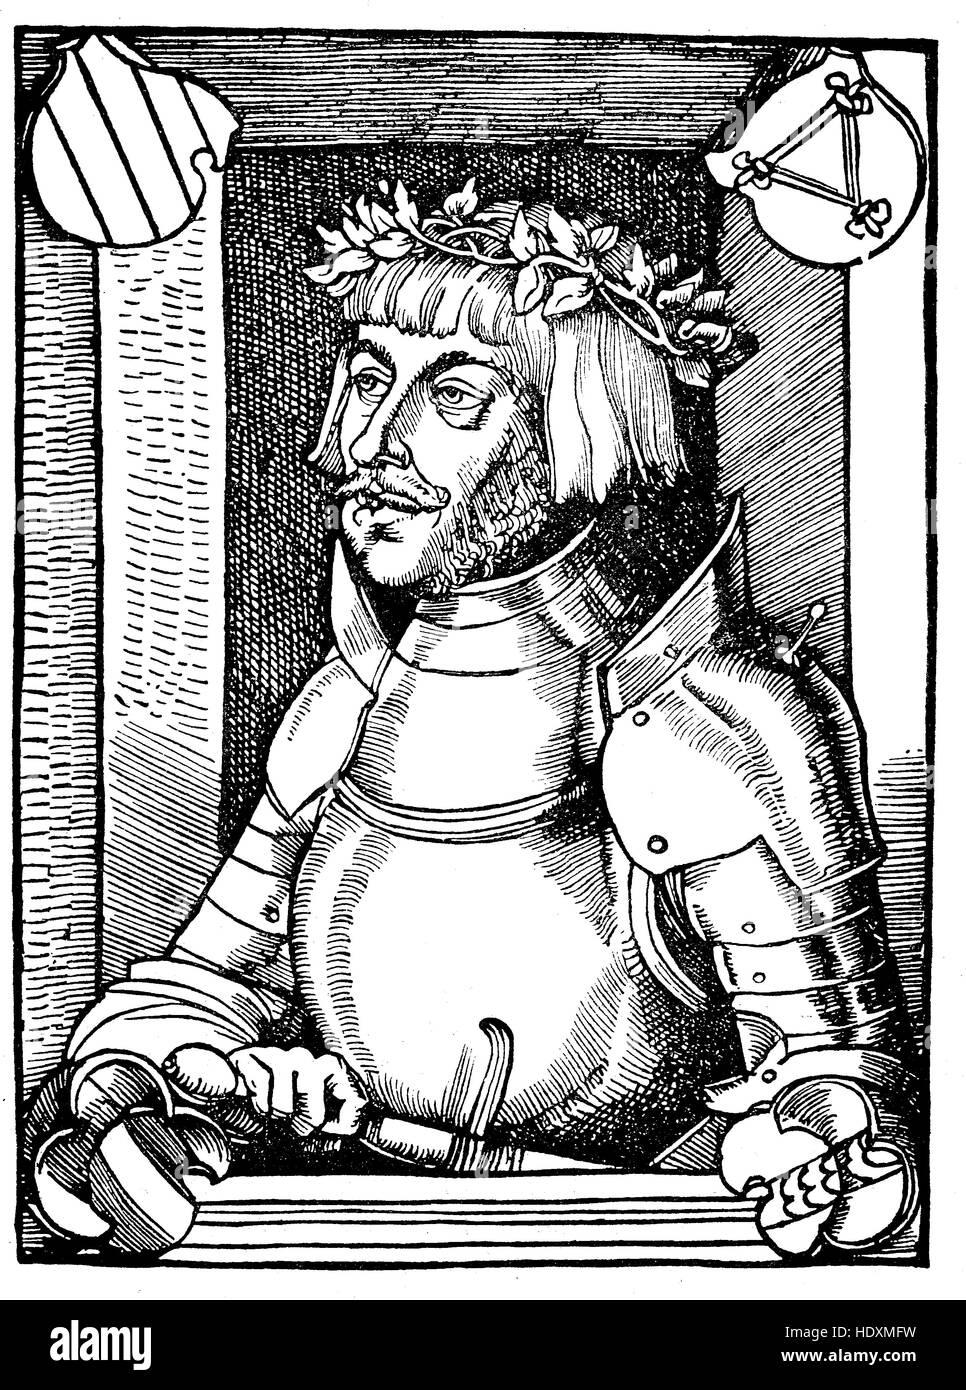 Ulrich von Hutten, 1488-1523, a German scholar, poet, satirist and reformer, woodcut from the year 1882, digital - Stock Image